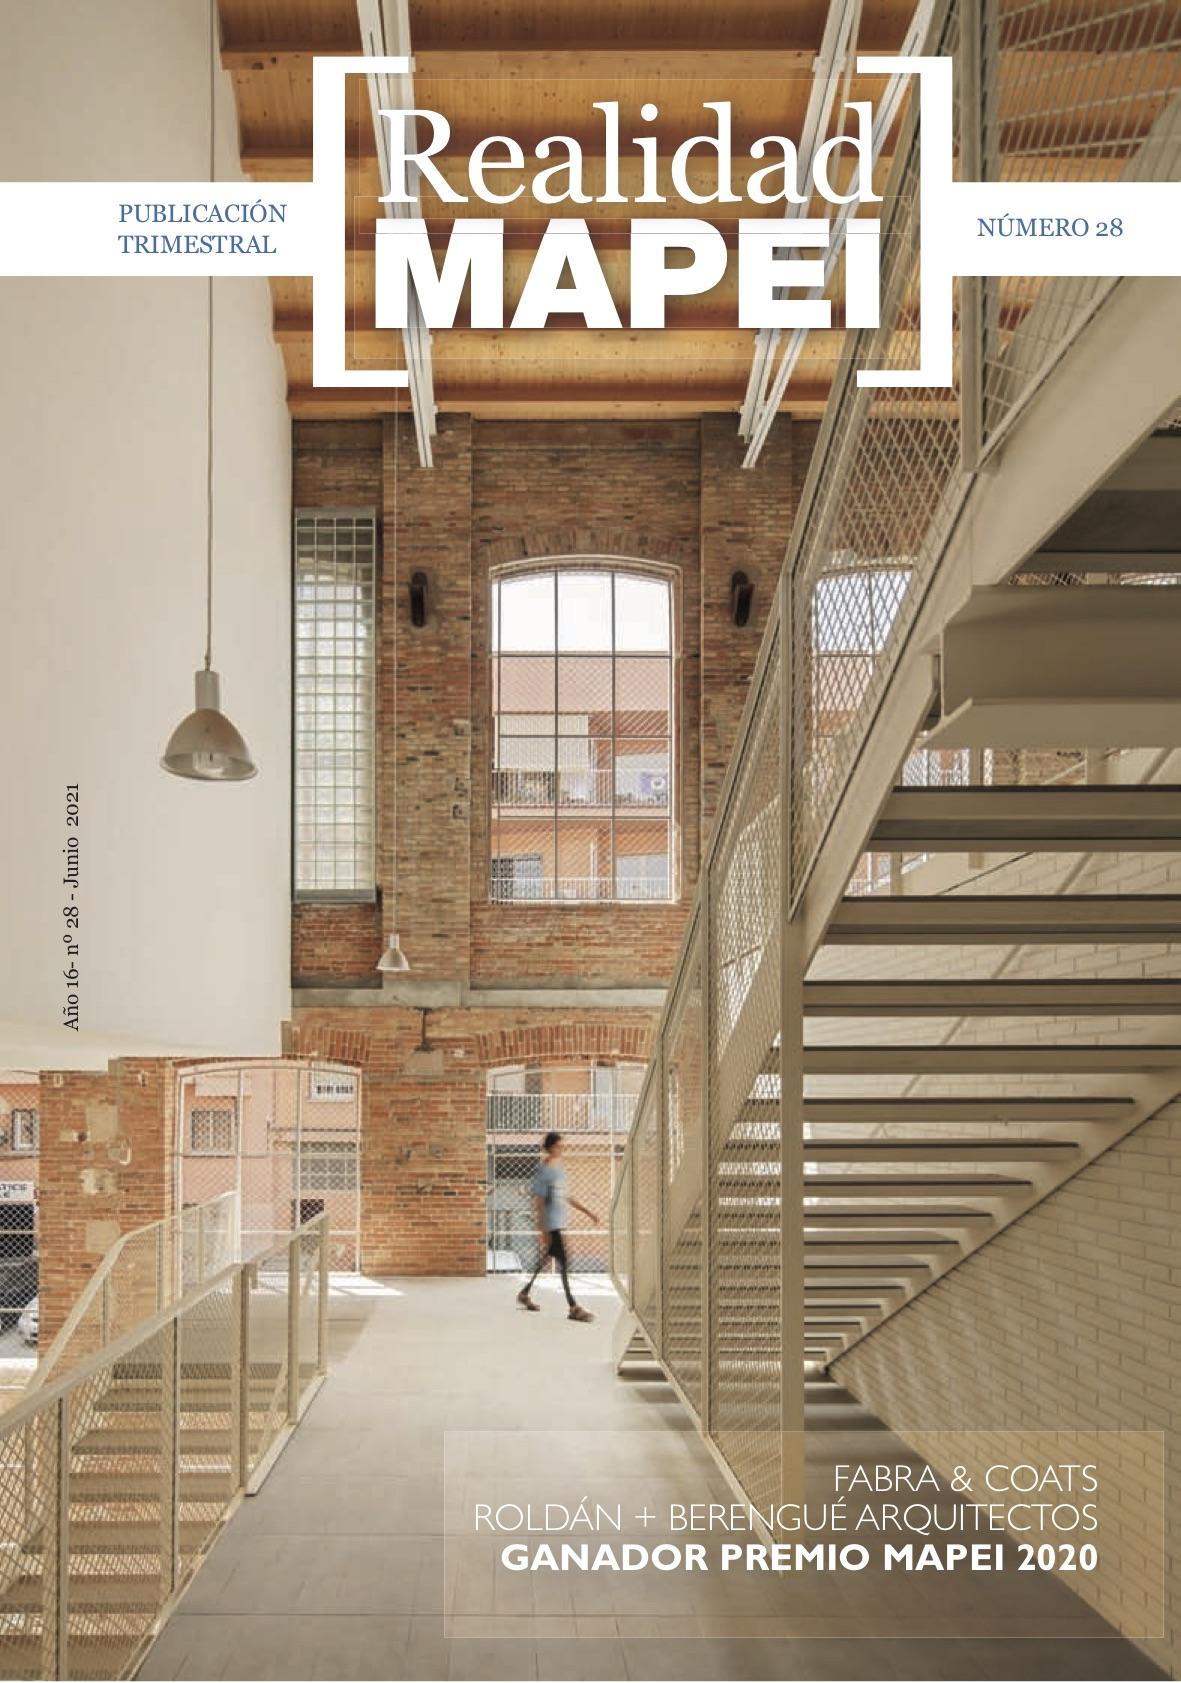 Publicada Realidad Mapei 28 especial Premio Mapei 2020